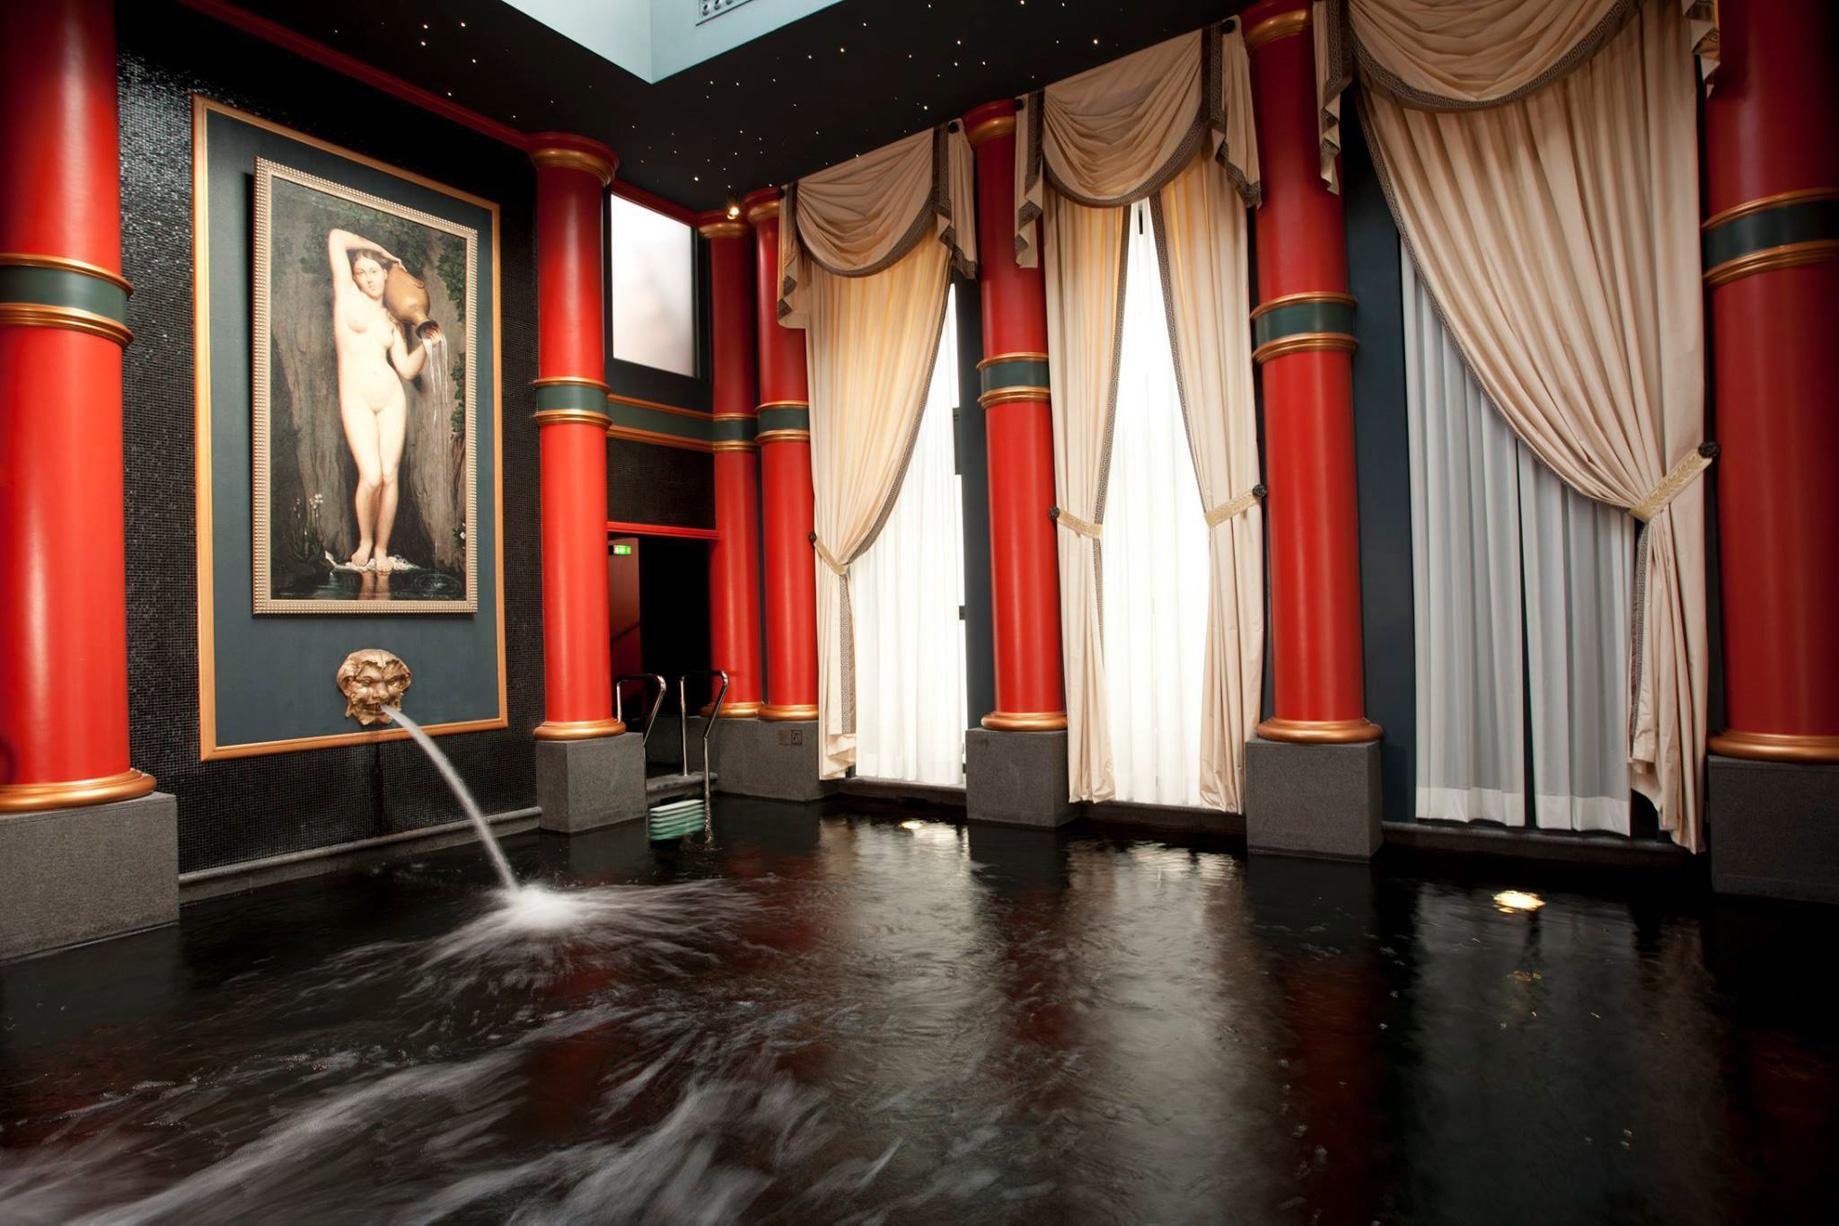 InterContinental Bordeaux Le Grand Hotel – Bordeaux, France – Spa Guerlain Relaxation Pool